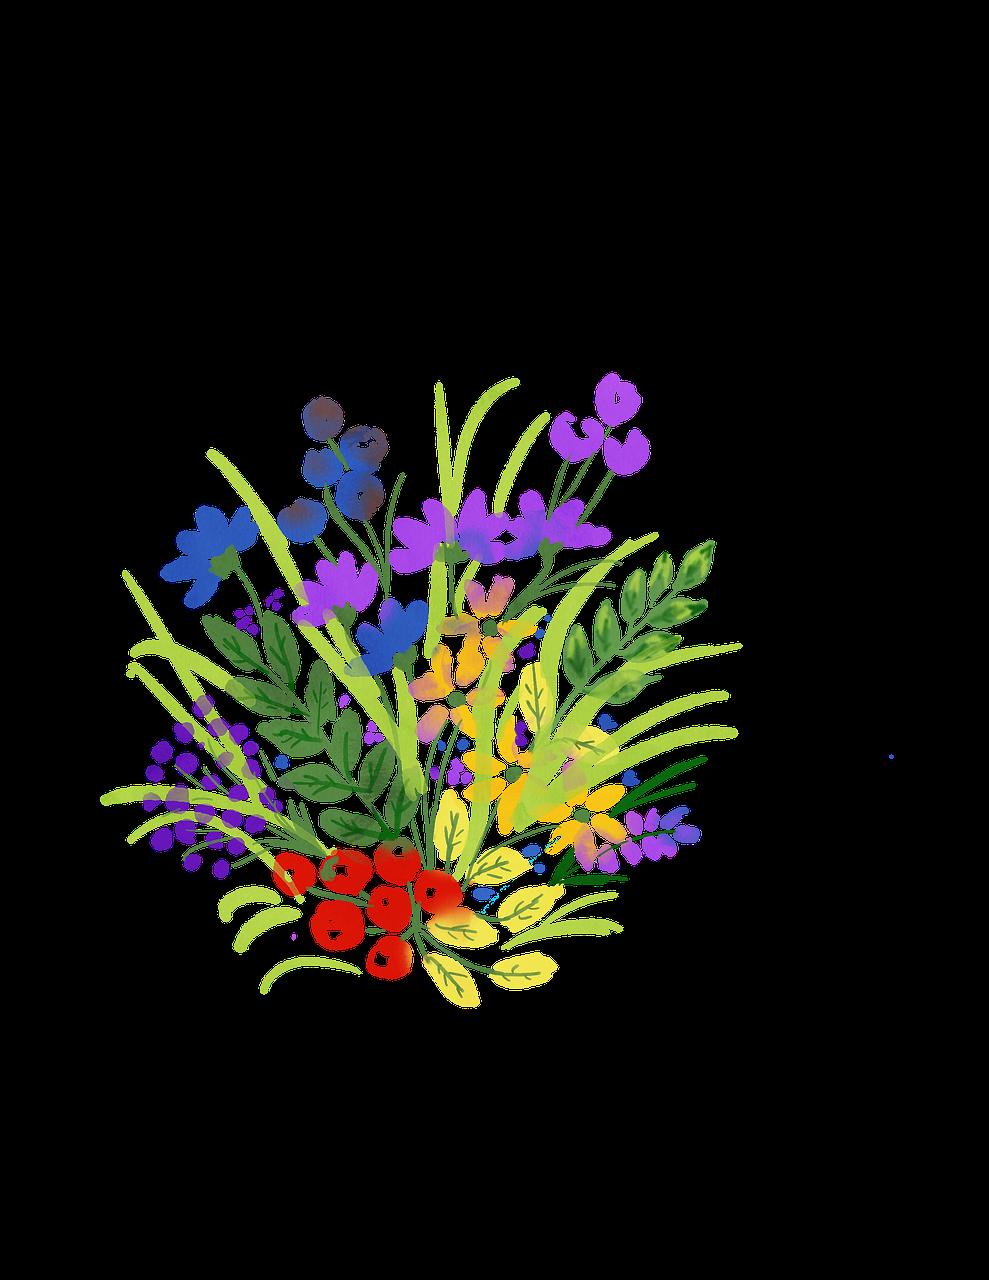 Watercolour Flower Spring Watercolor Floral Bouquet Free